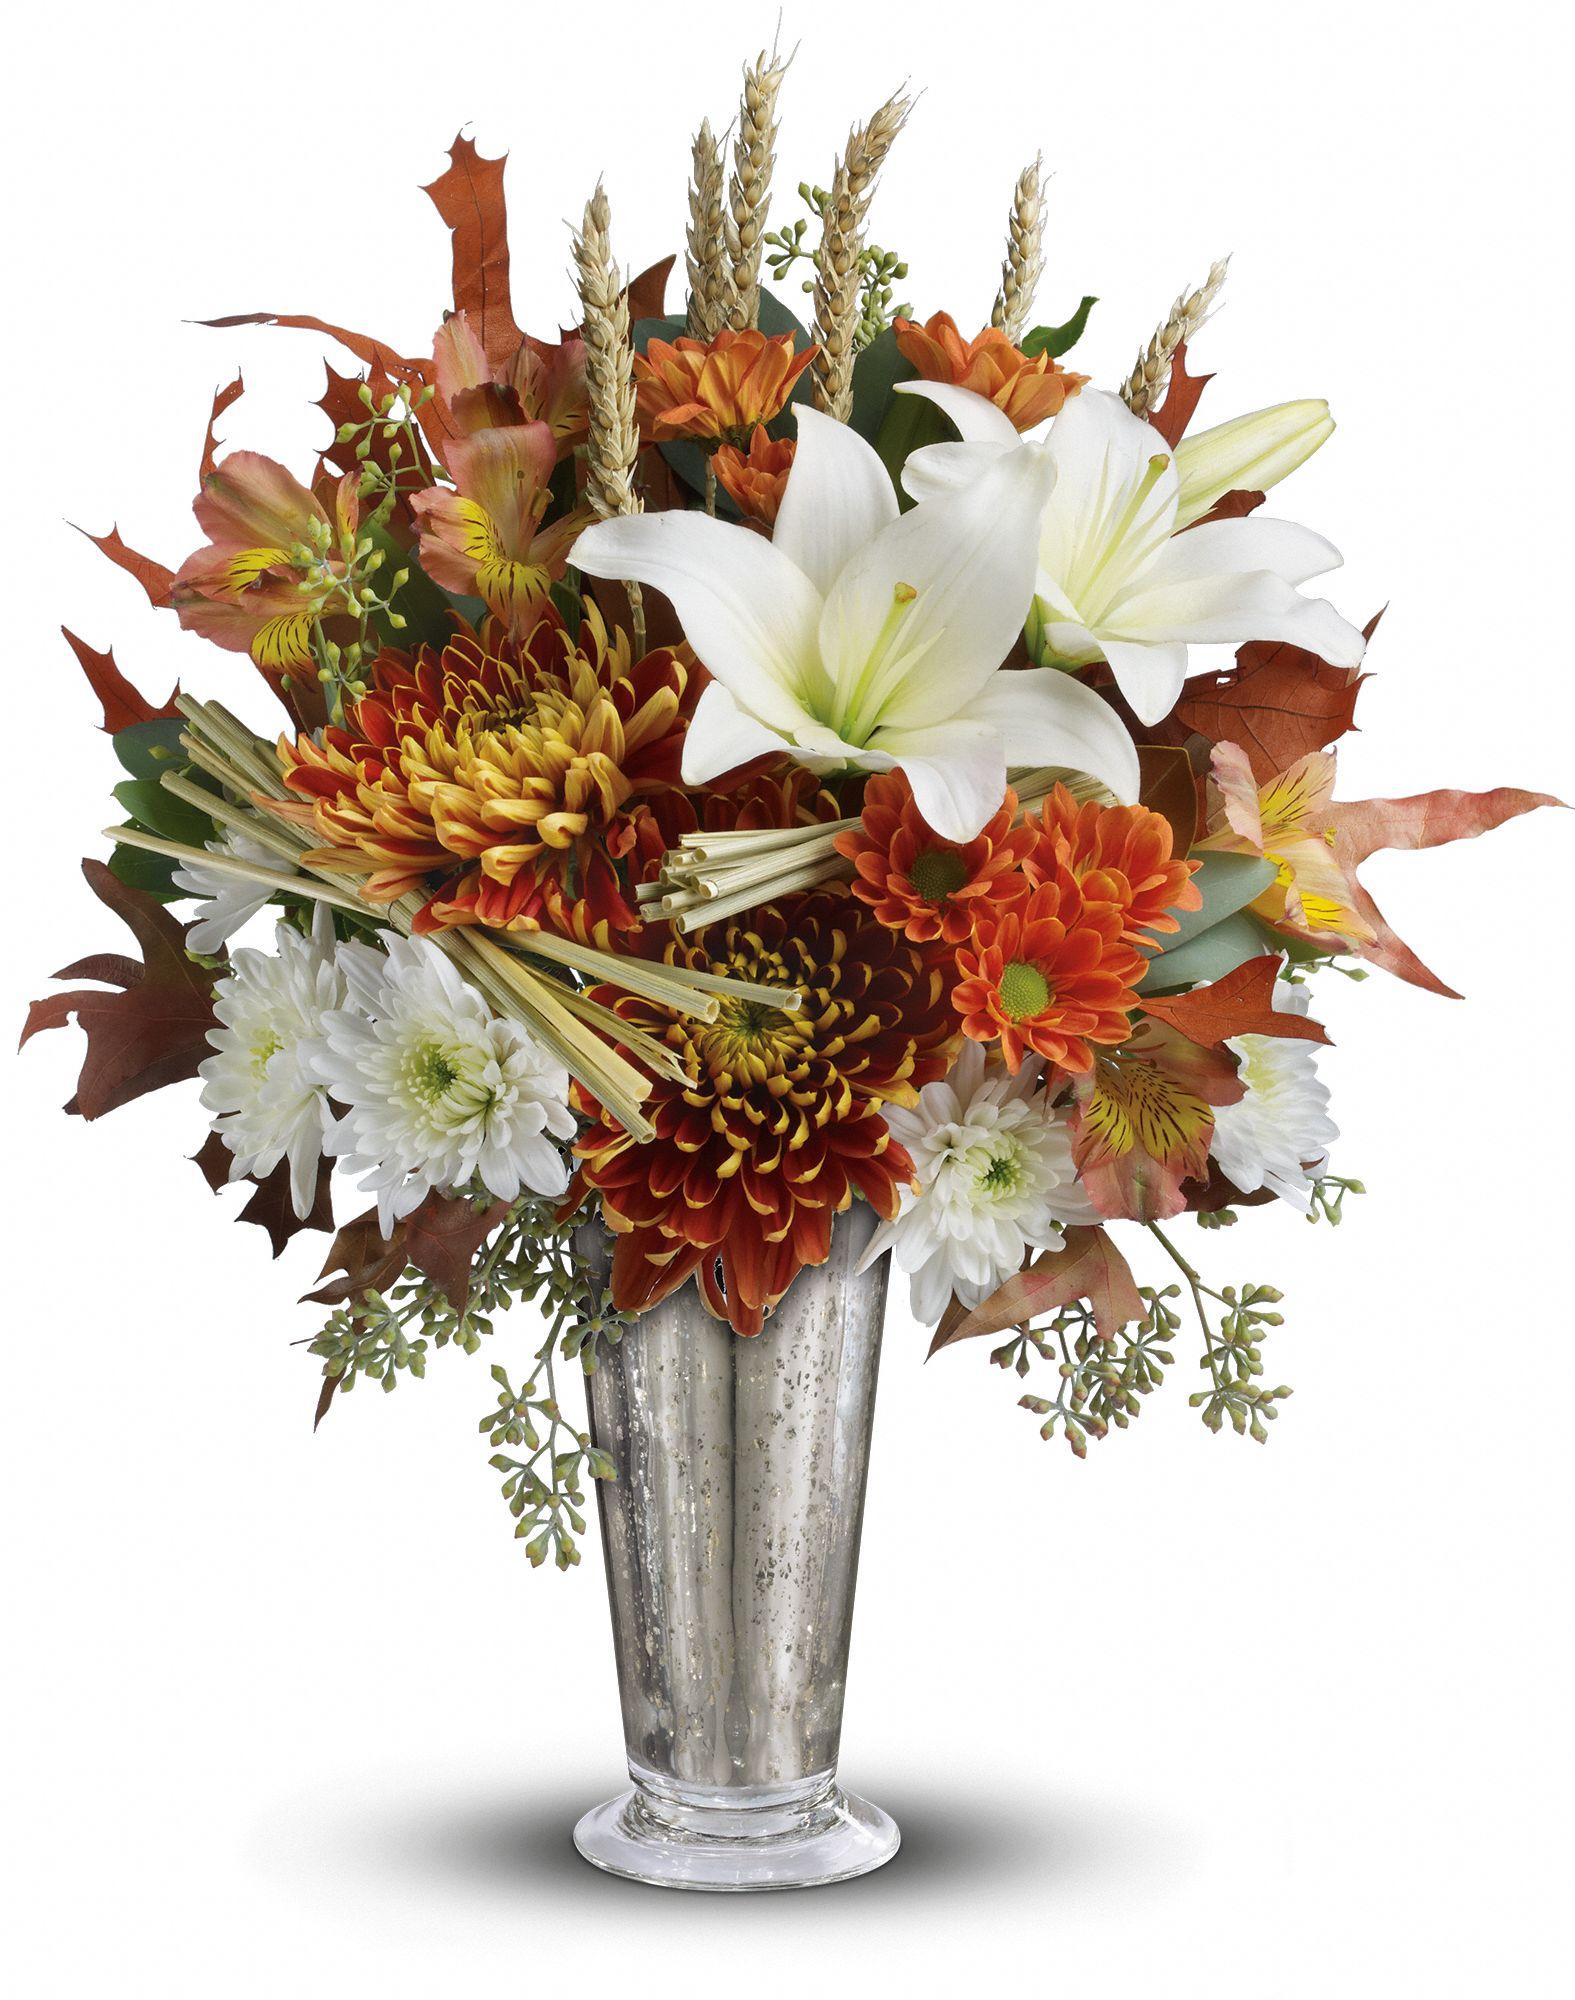 Teleflora's Harvest Splendor Bouquet $49.95